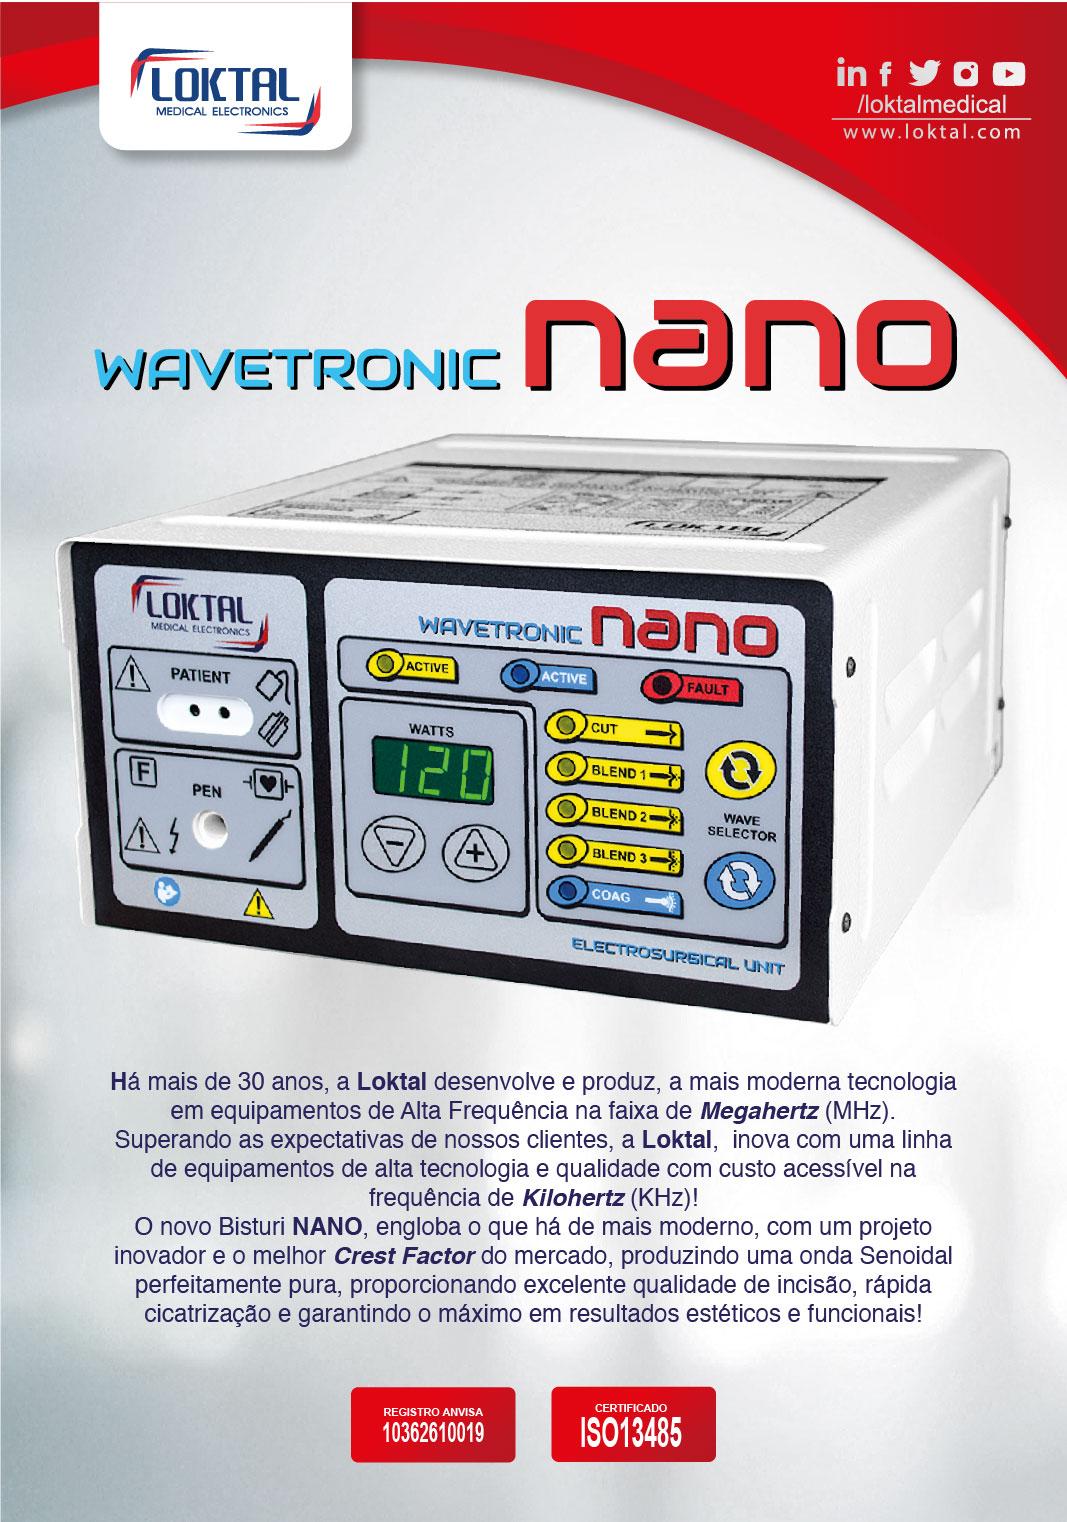 EQBI0009 - Wavetronic NANO